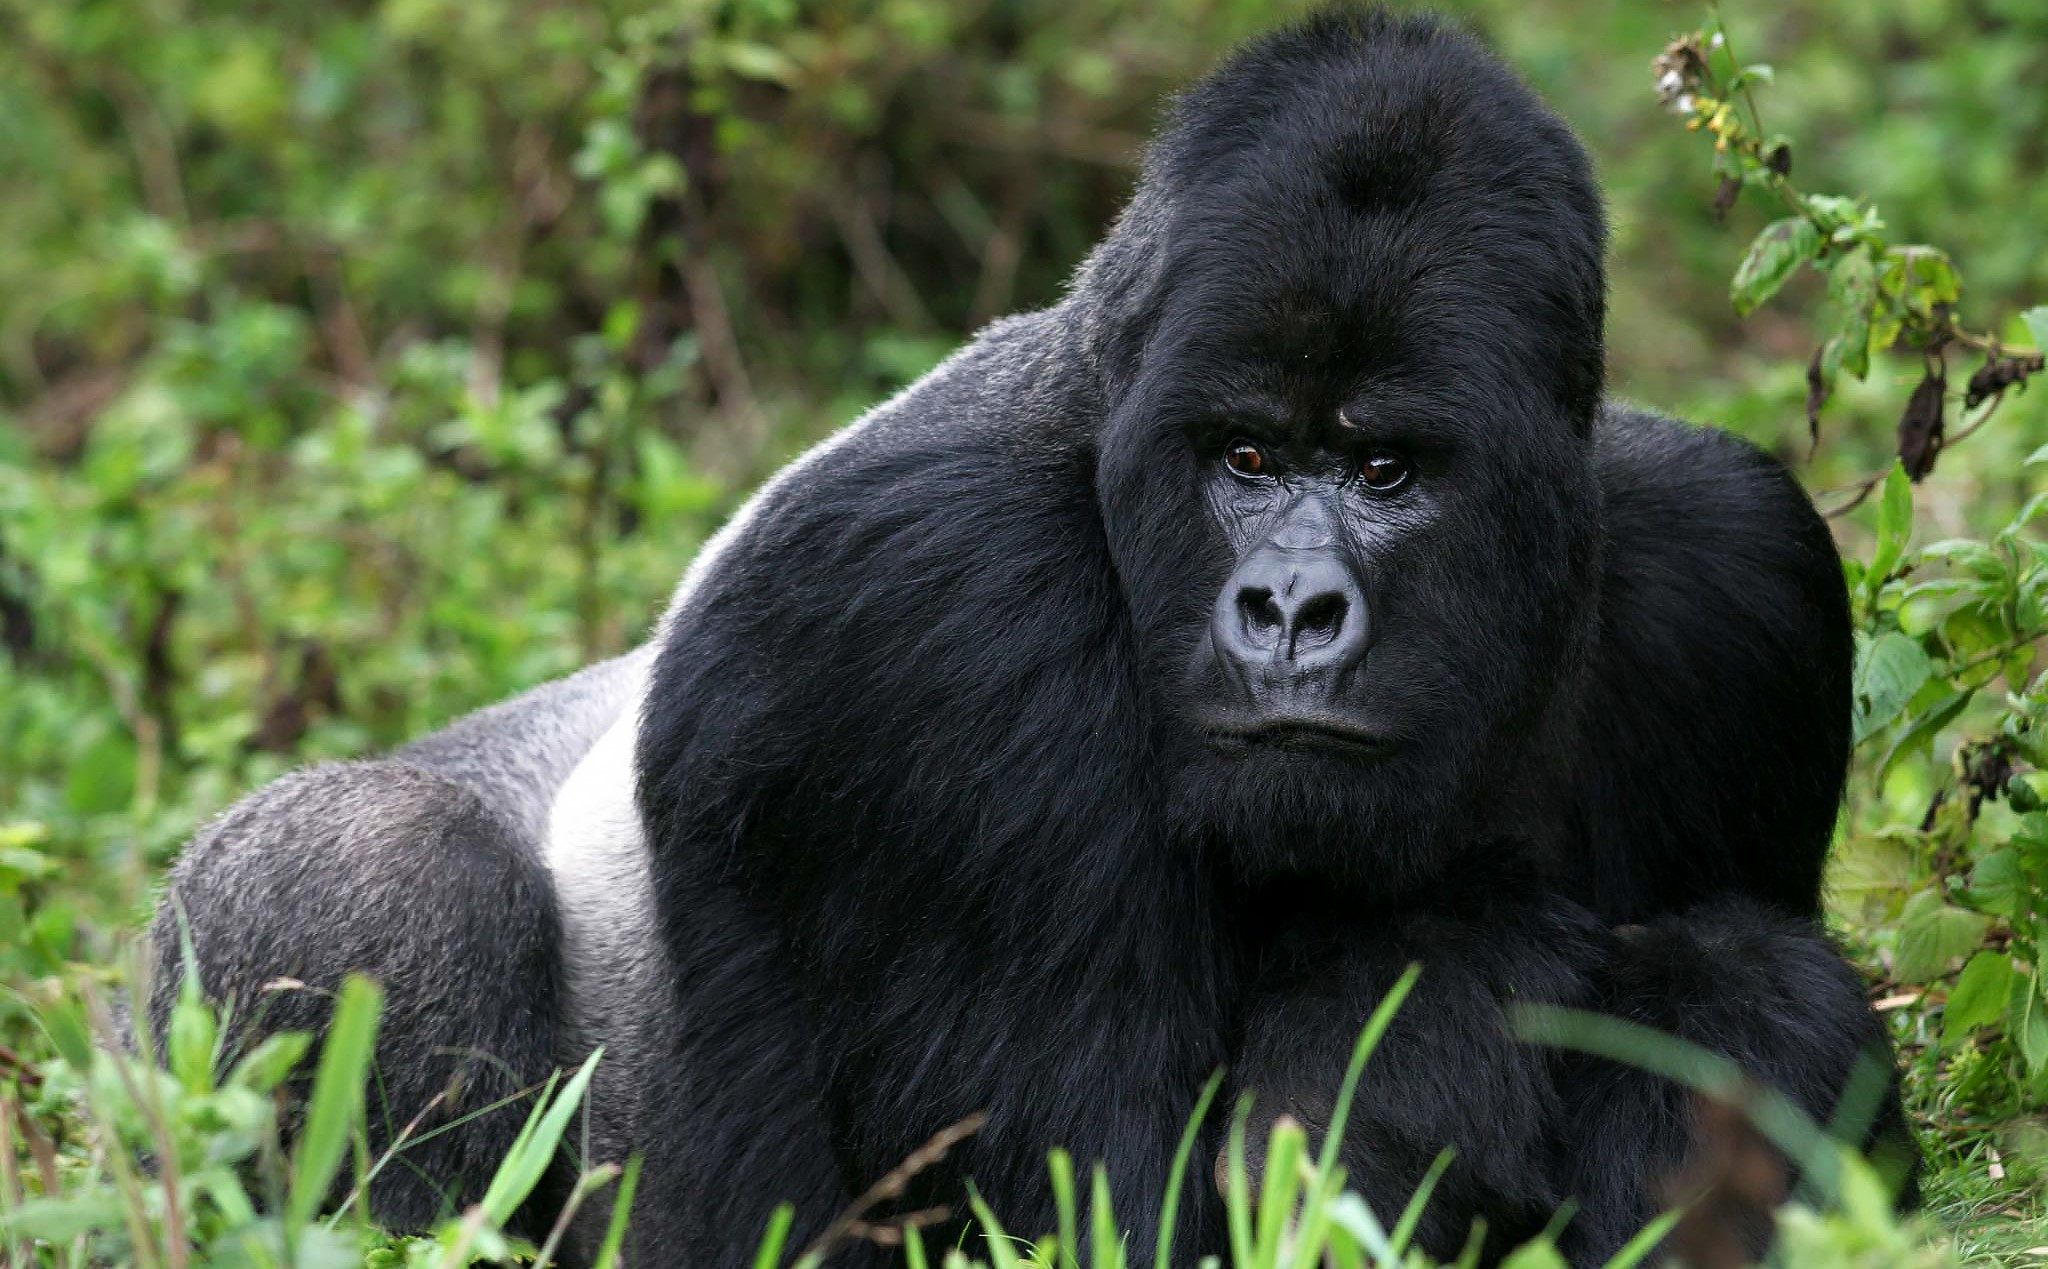 Gorilla trekking in Rwanda is a bucket-list travel item